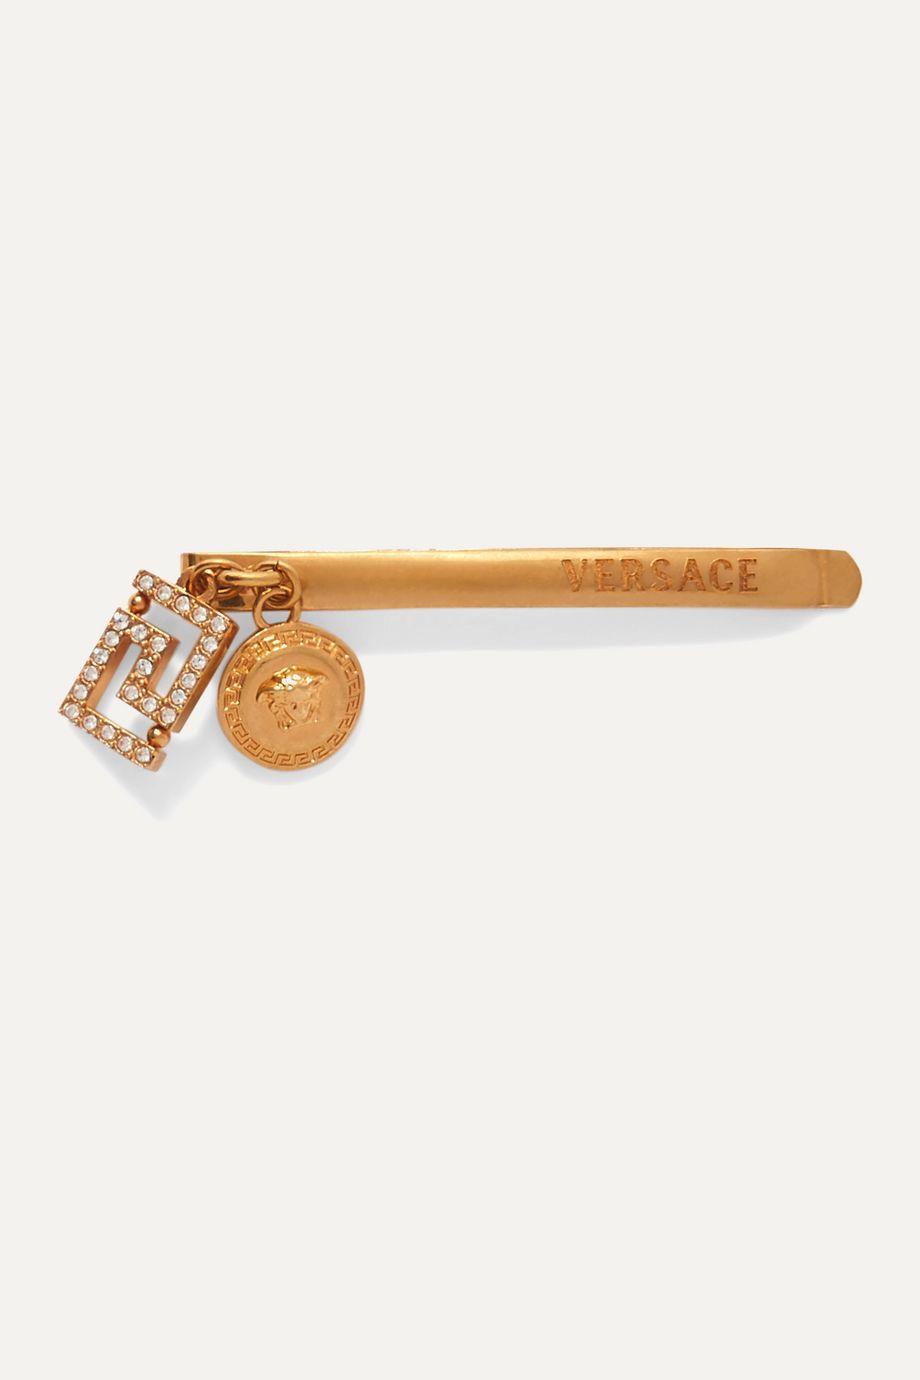 Versace Gold-tone crystal hair slide